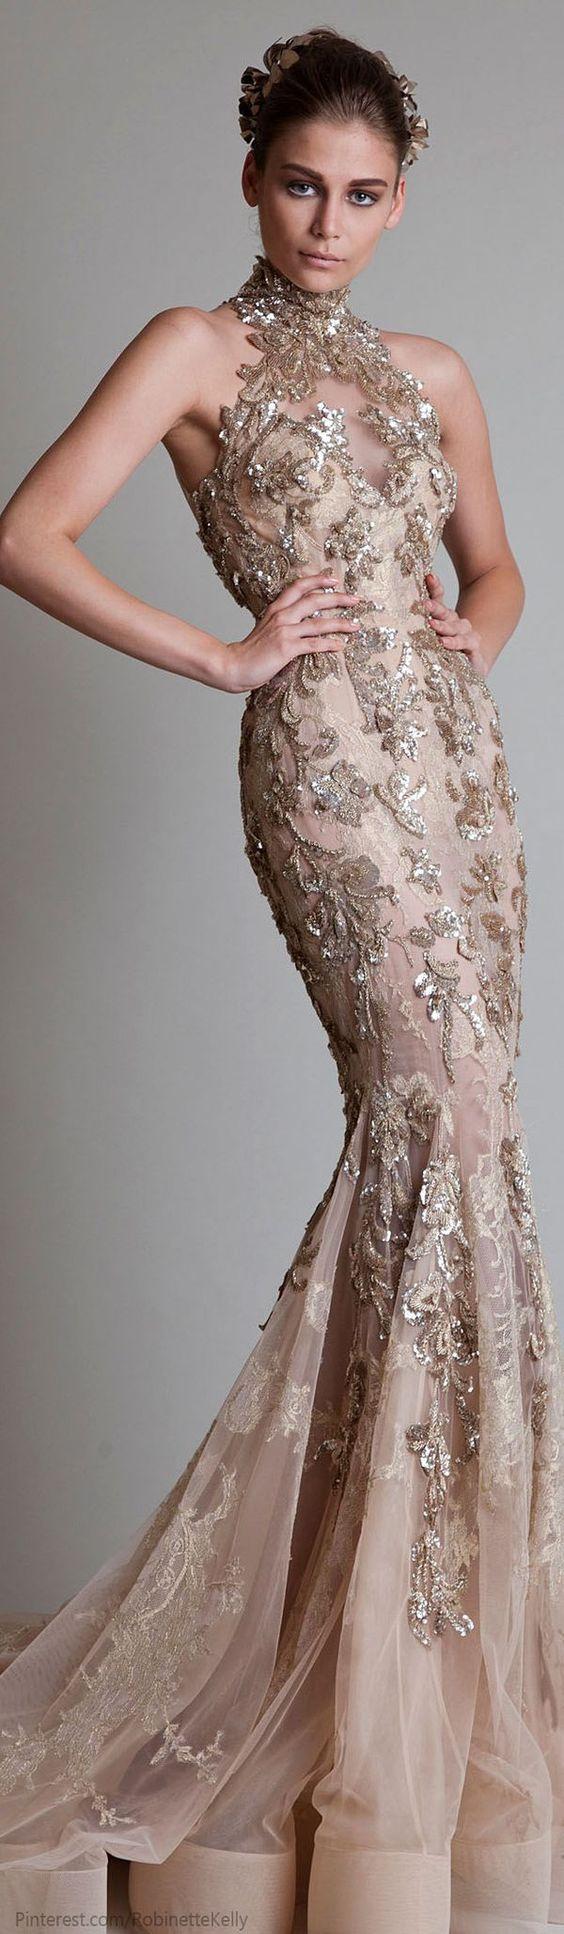 krikor jabotian1 - Vestidos de Noiva Coloridos - Inspirações